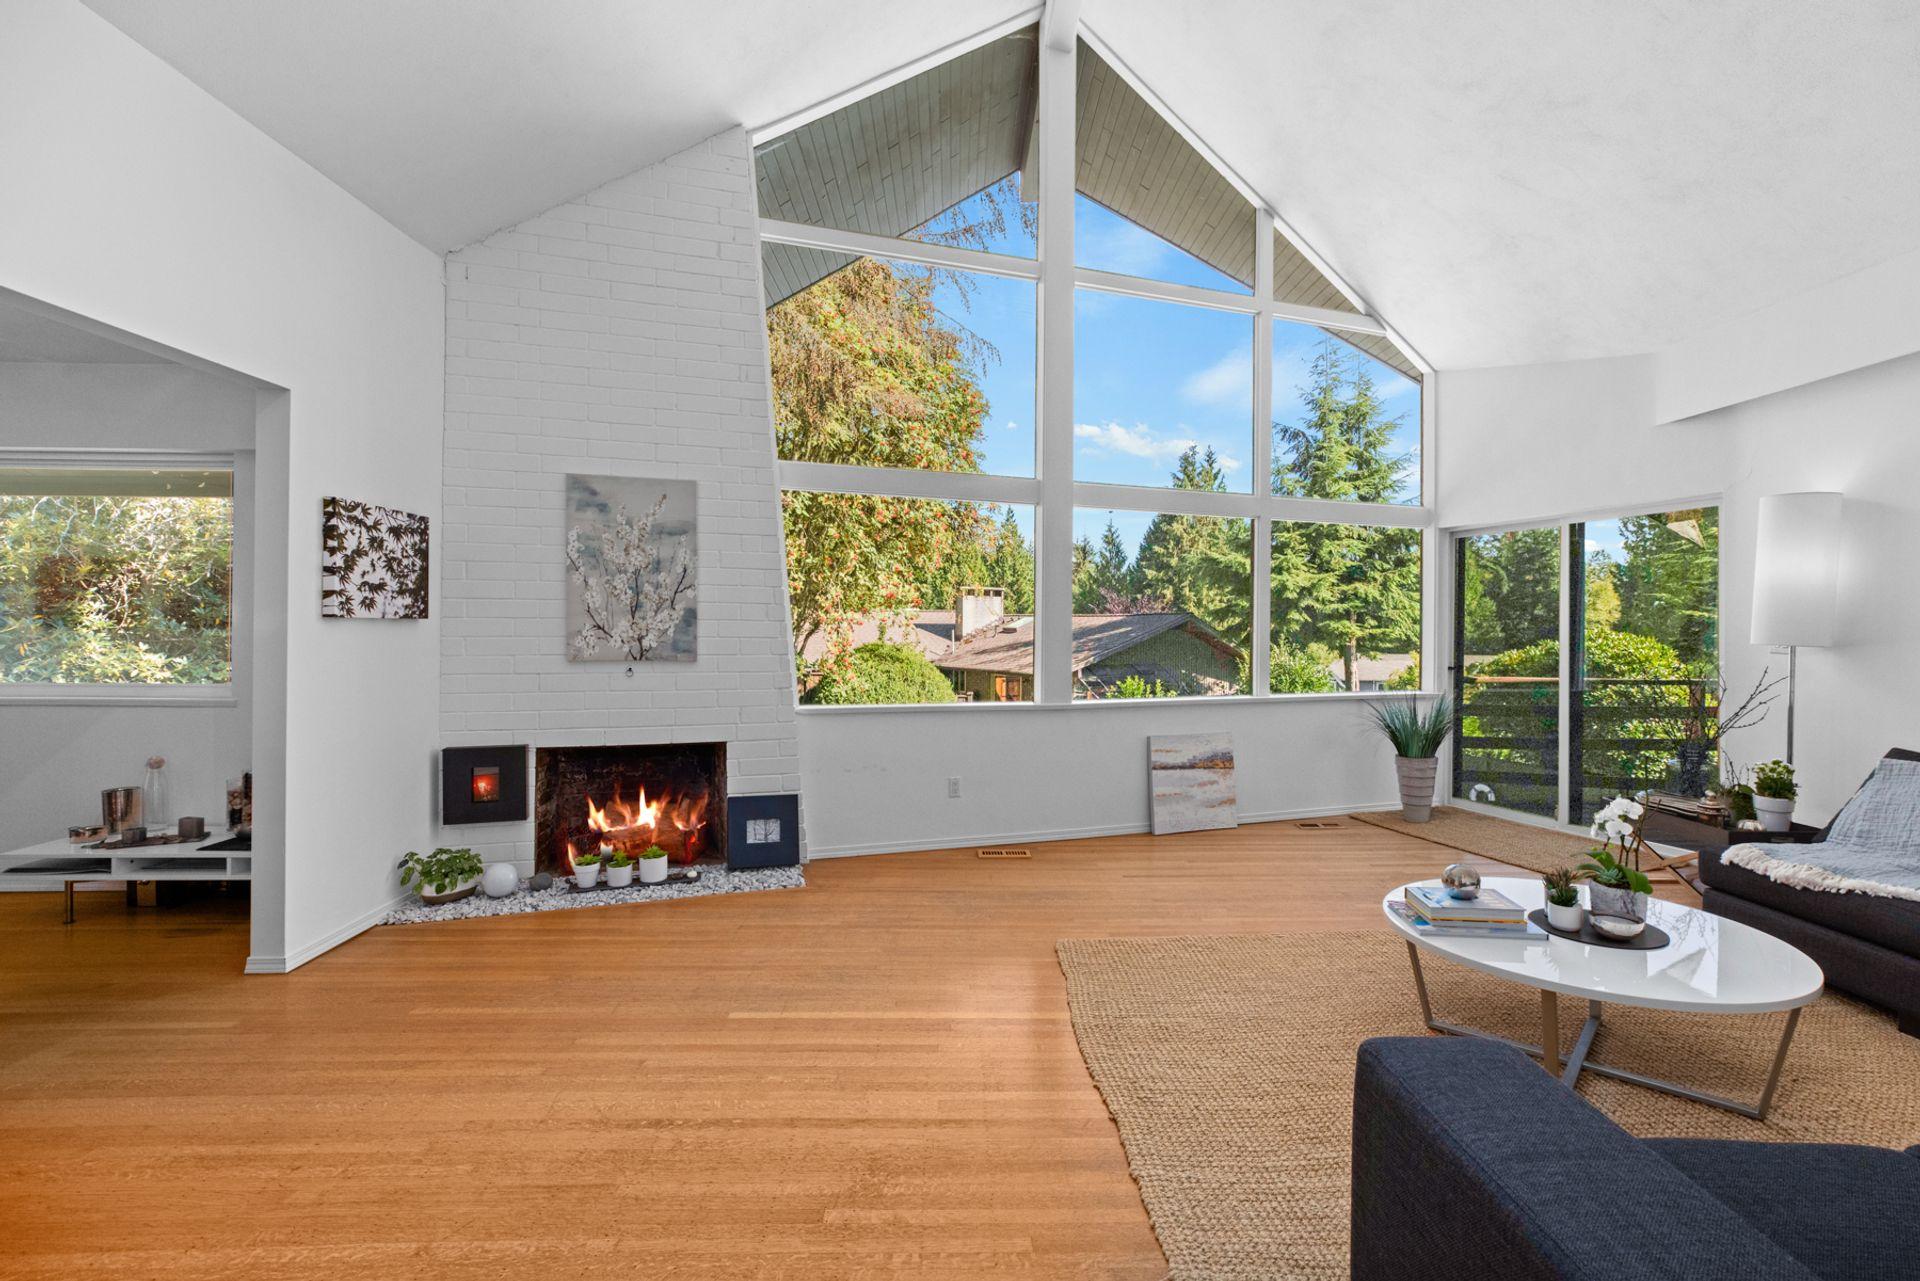 86 Stevens Drive, British Properties, West Vancouver - web-3